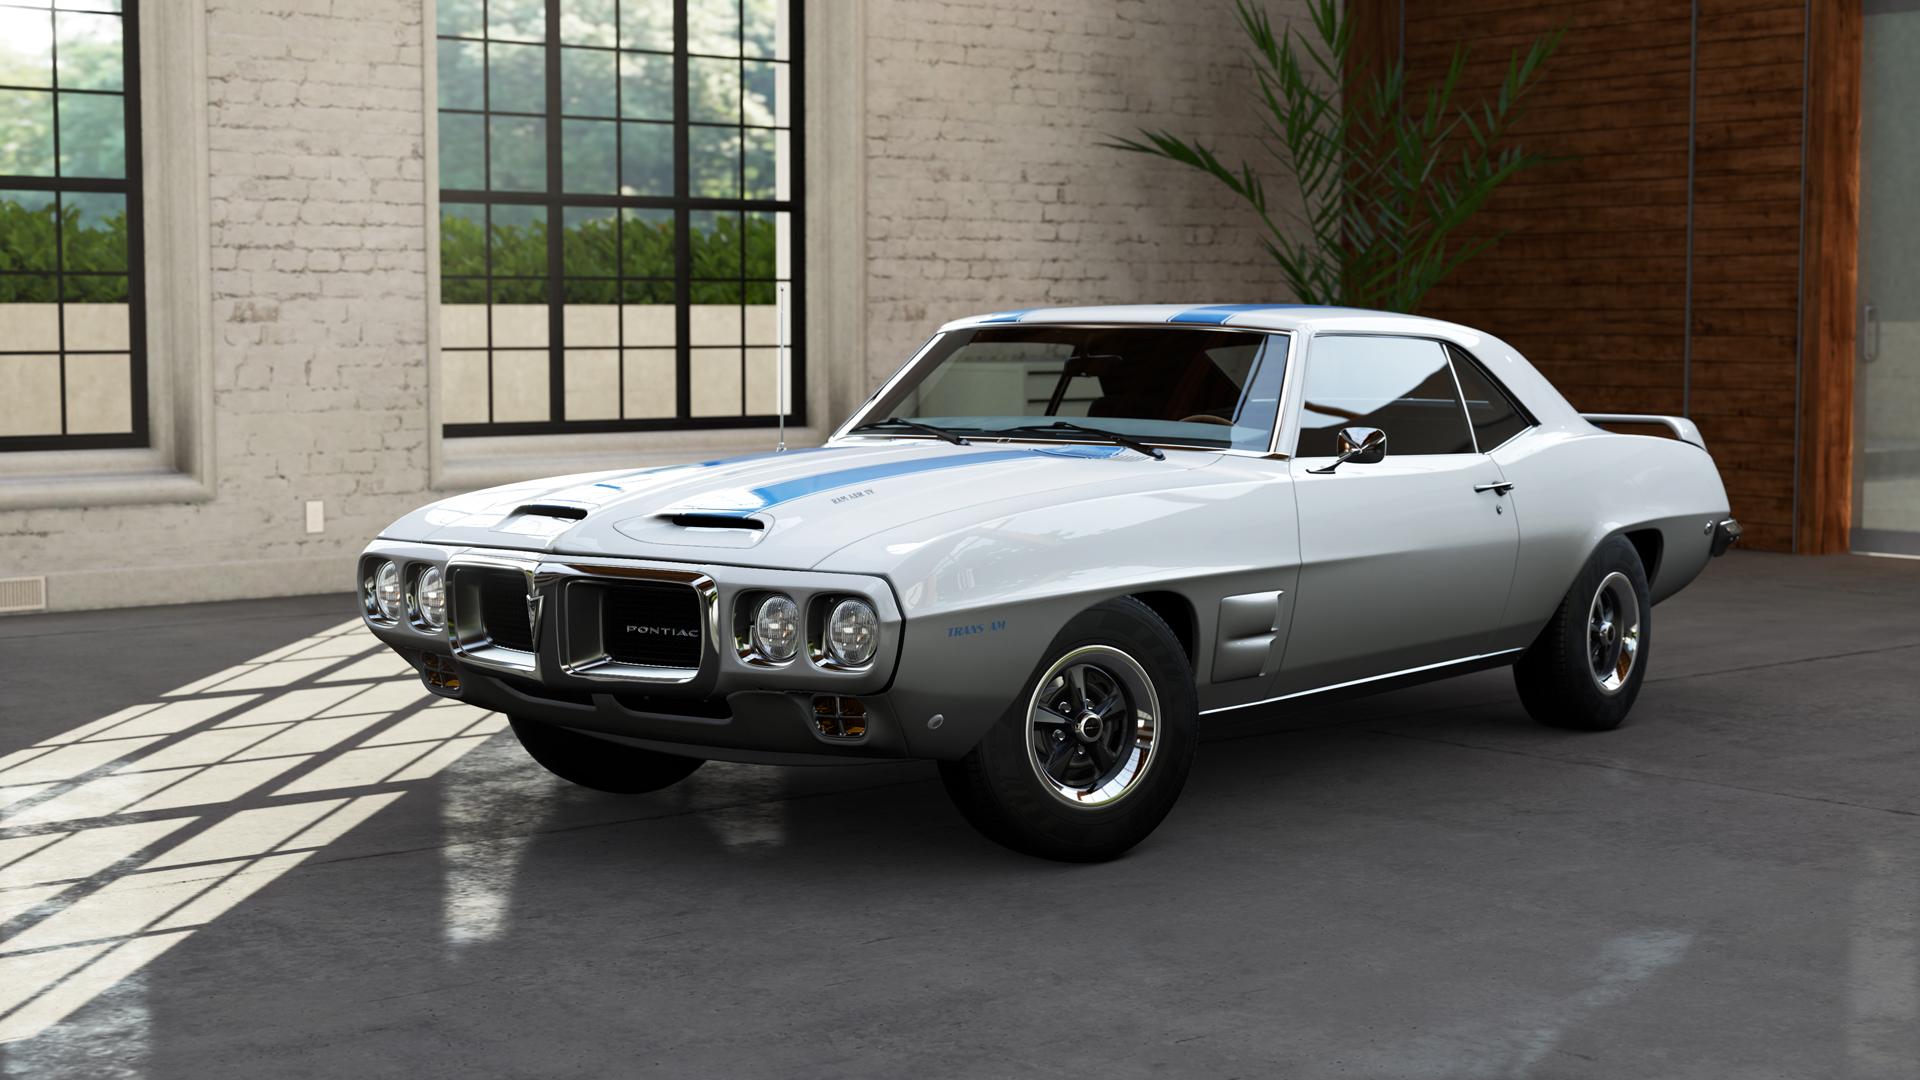 Pontiac Firebird I 1967 - 1969 Coupe-Hardtop #4